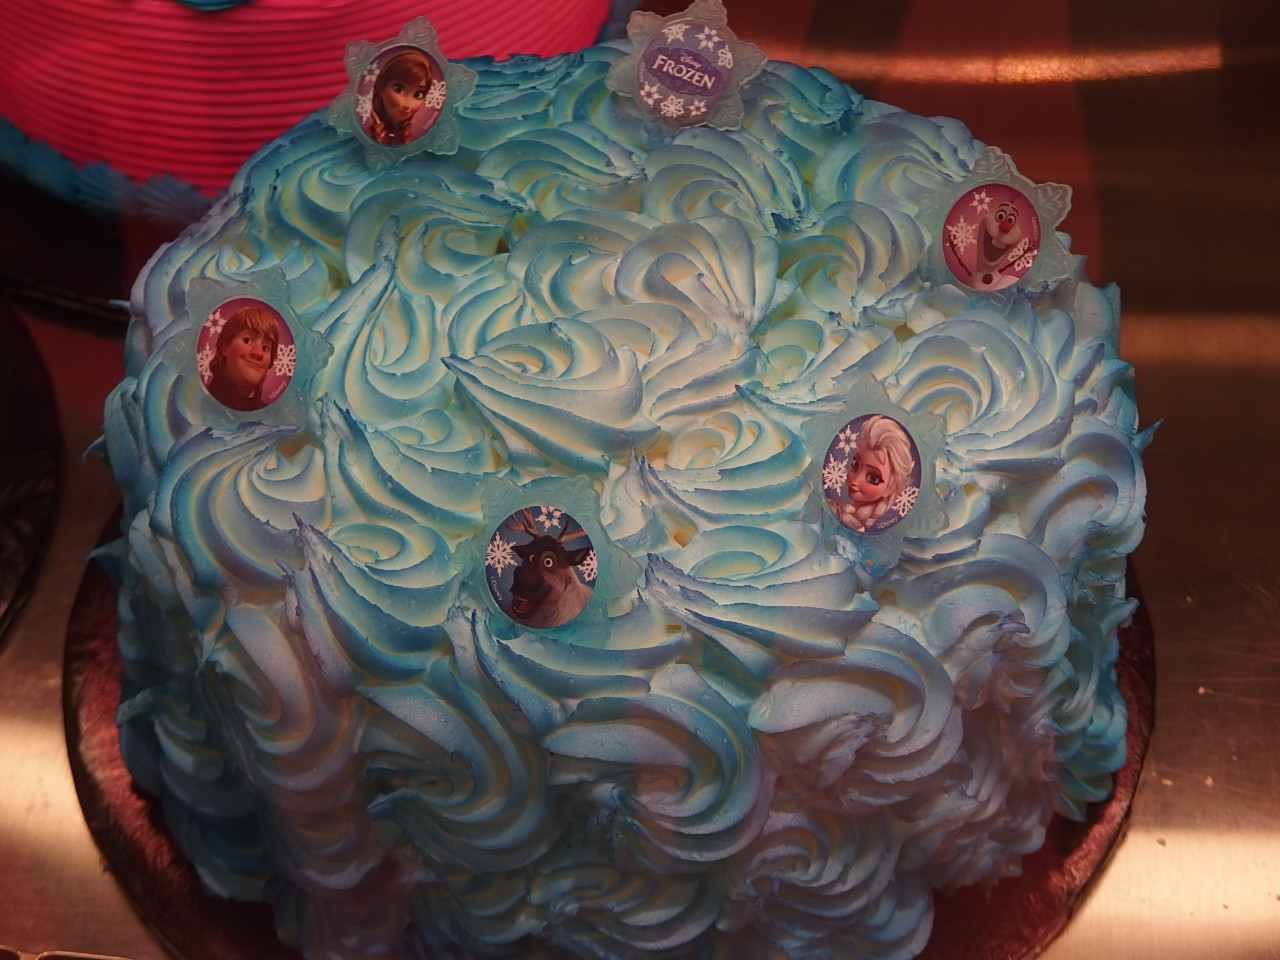 pastries - bakery cake